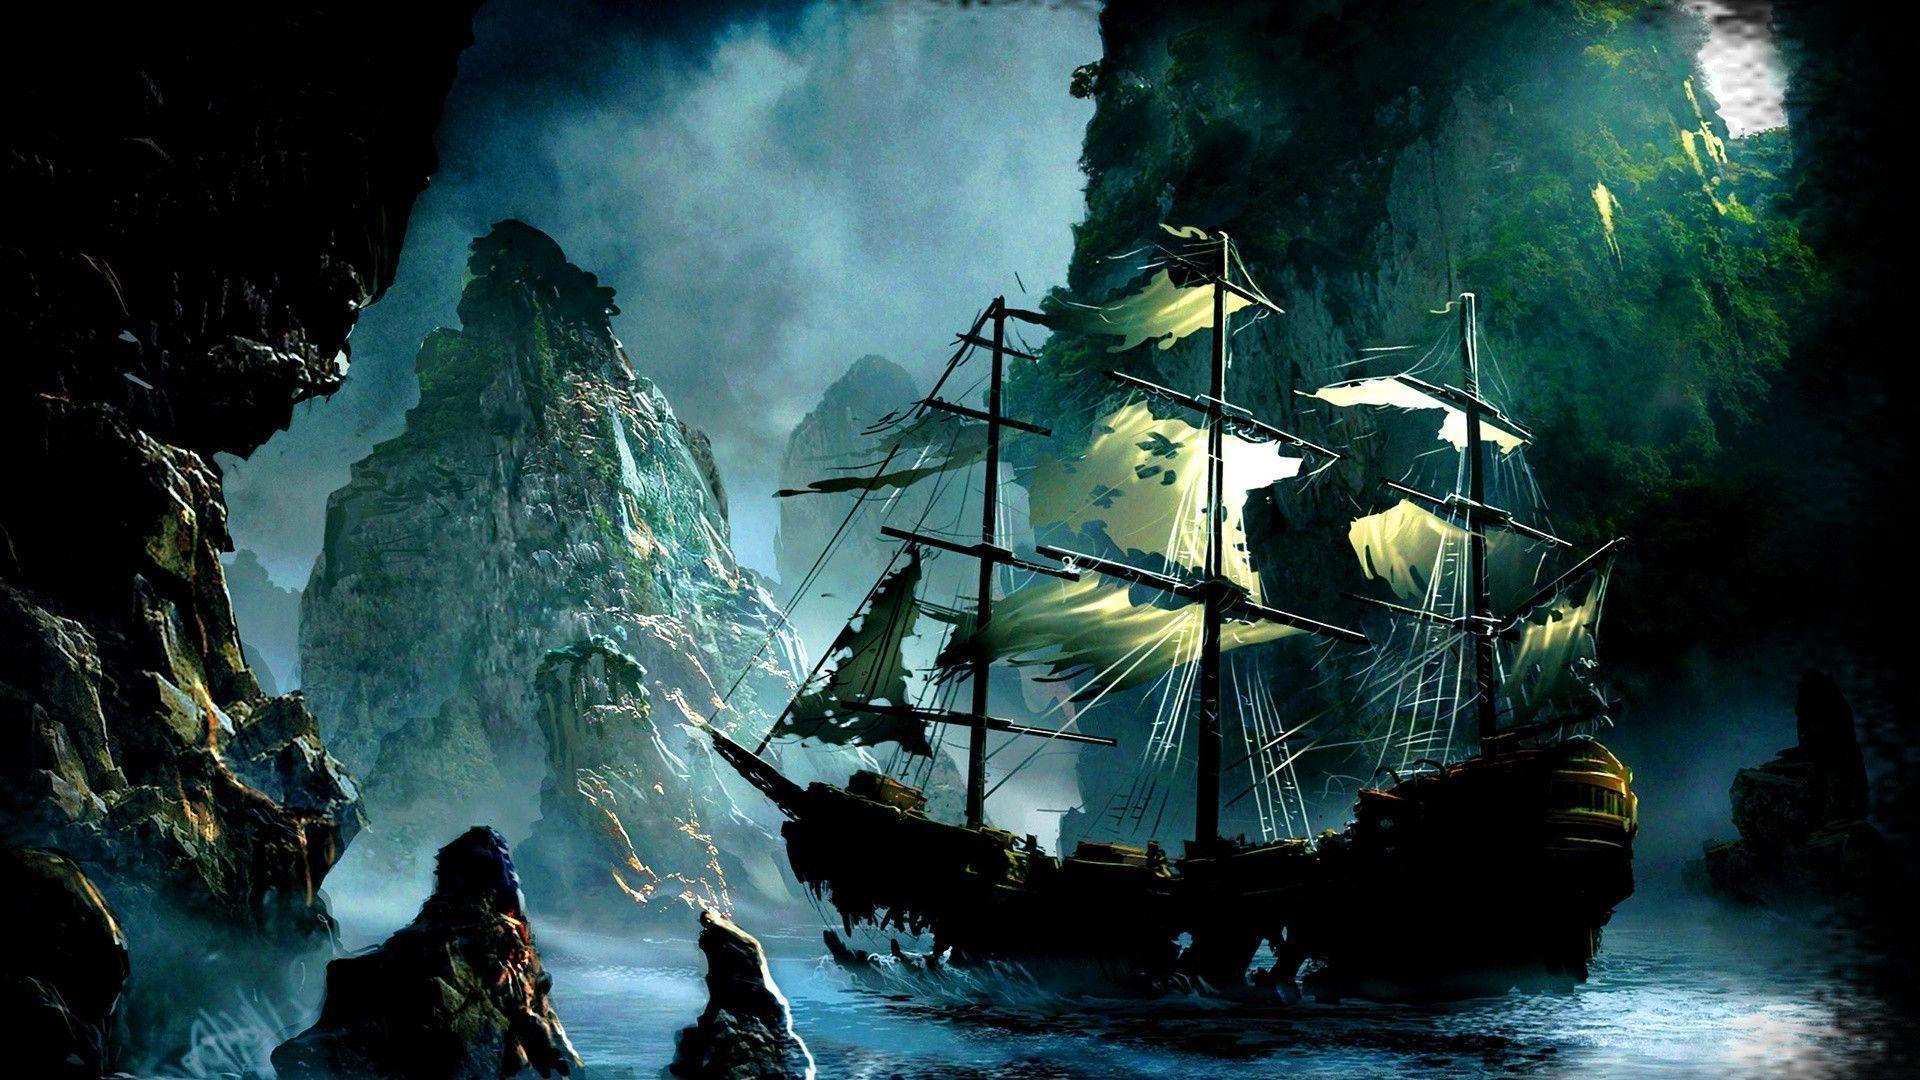 Old Pirate Ship Wallpaper | Queenwallpaper.